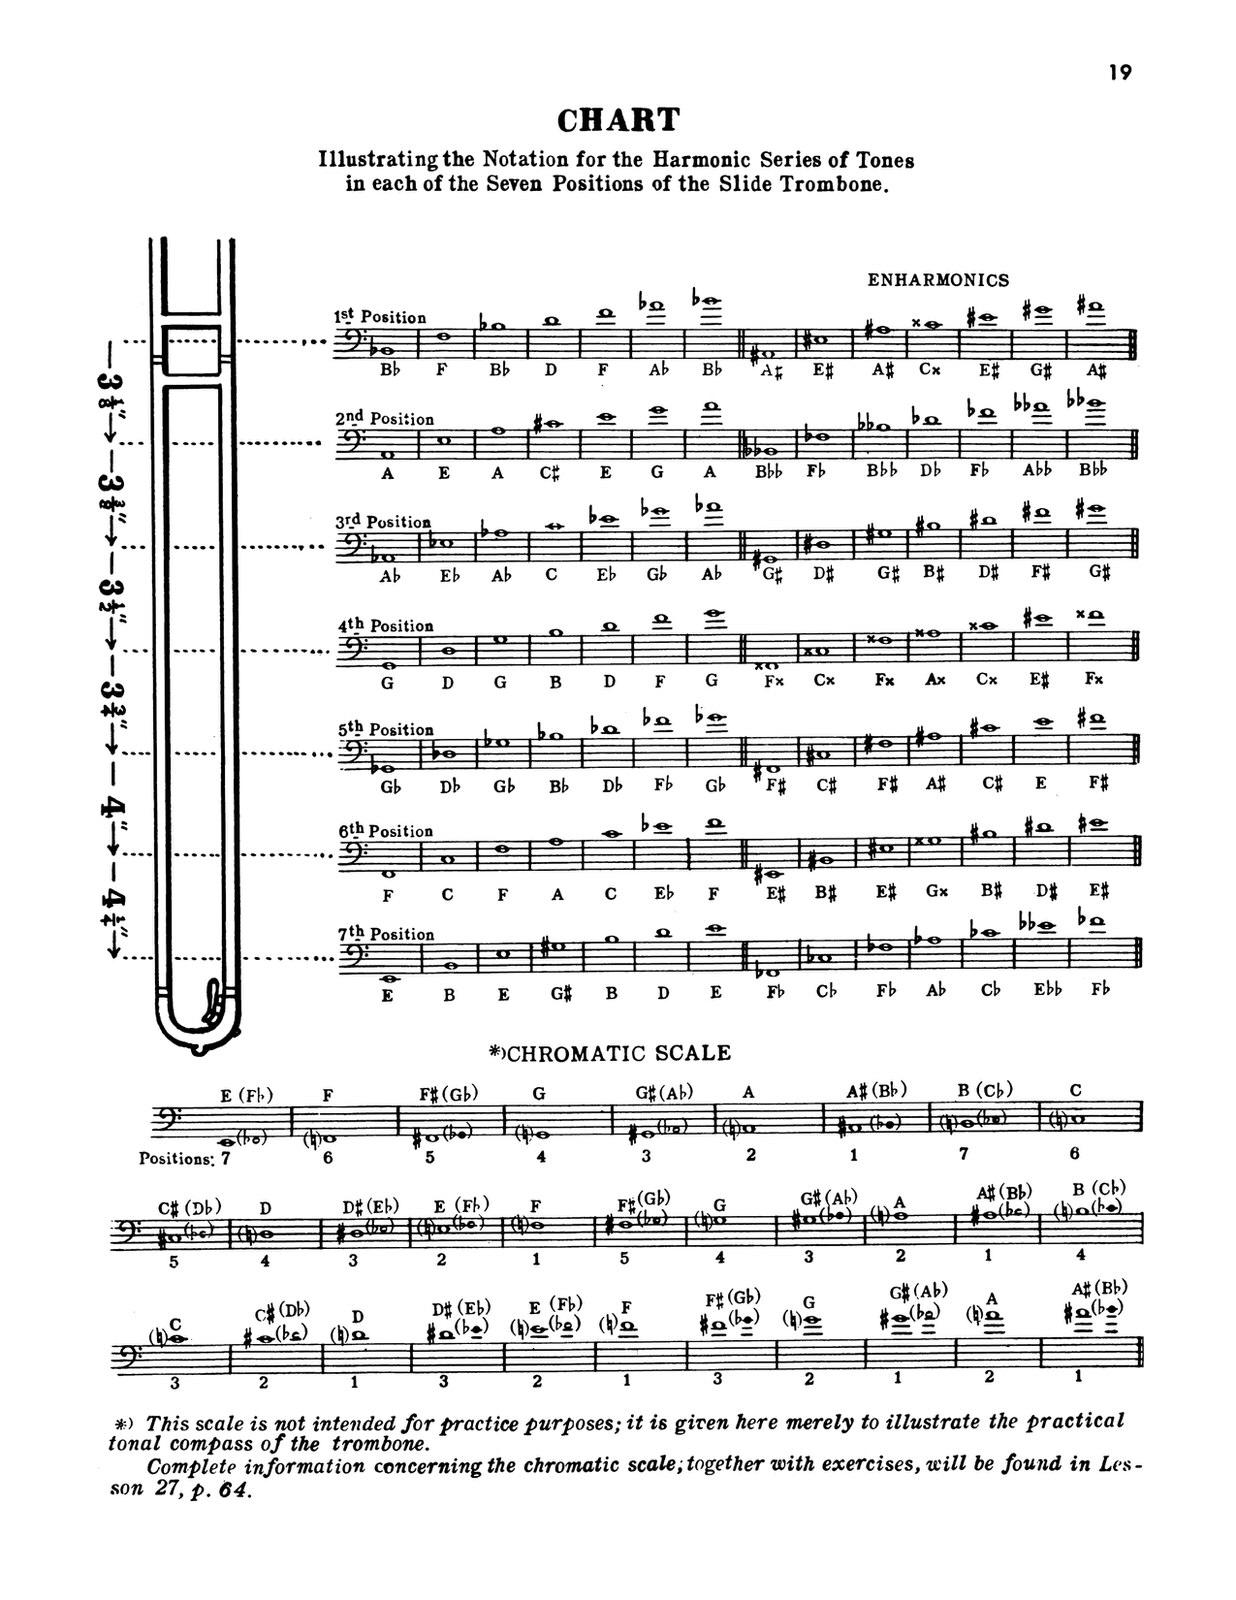 Clean Dorsey, The Modern Trombonist 4